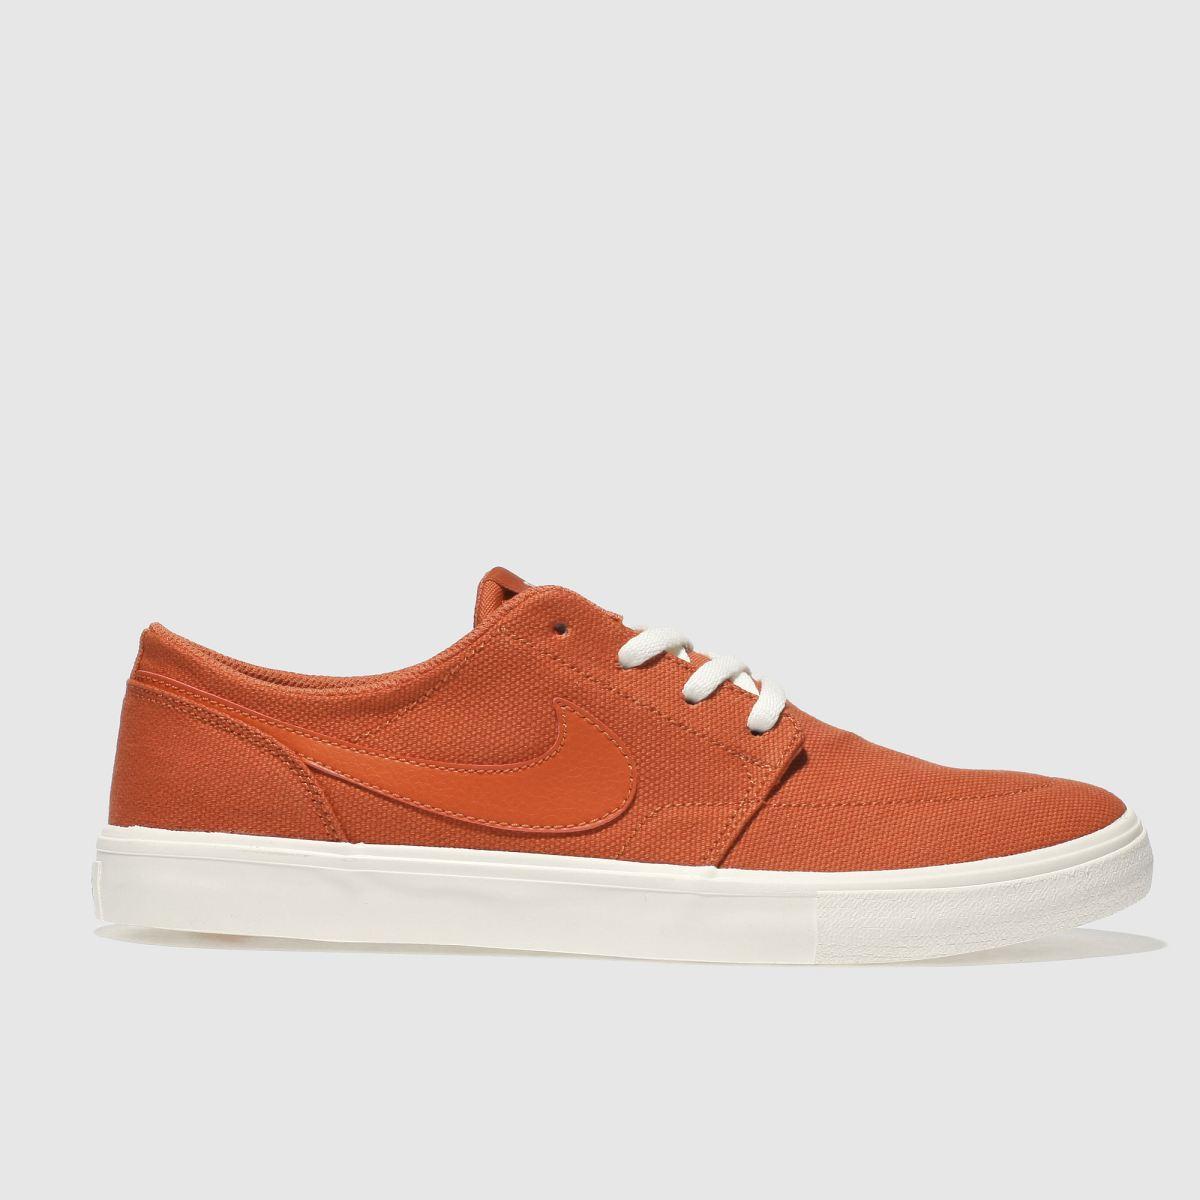 Nike Sb Orange Portmore Ii Solarsoft Trainers